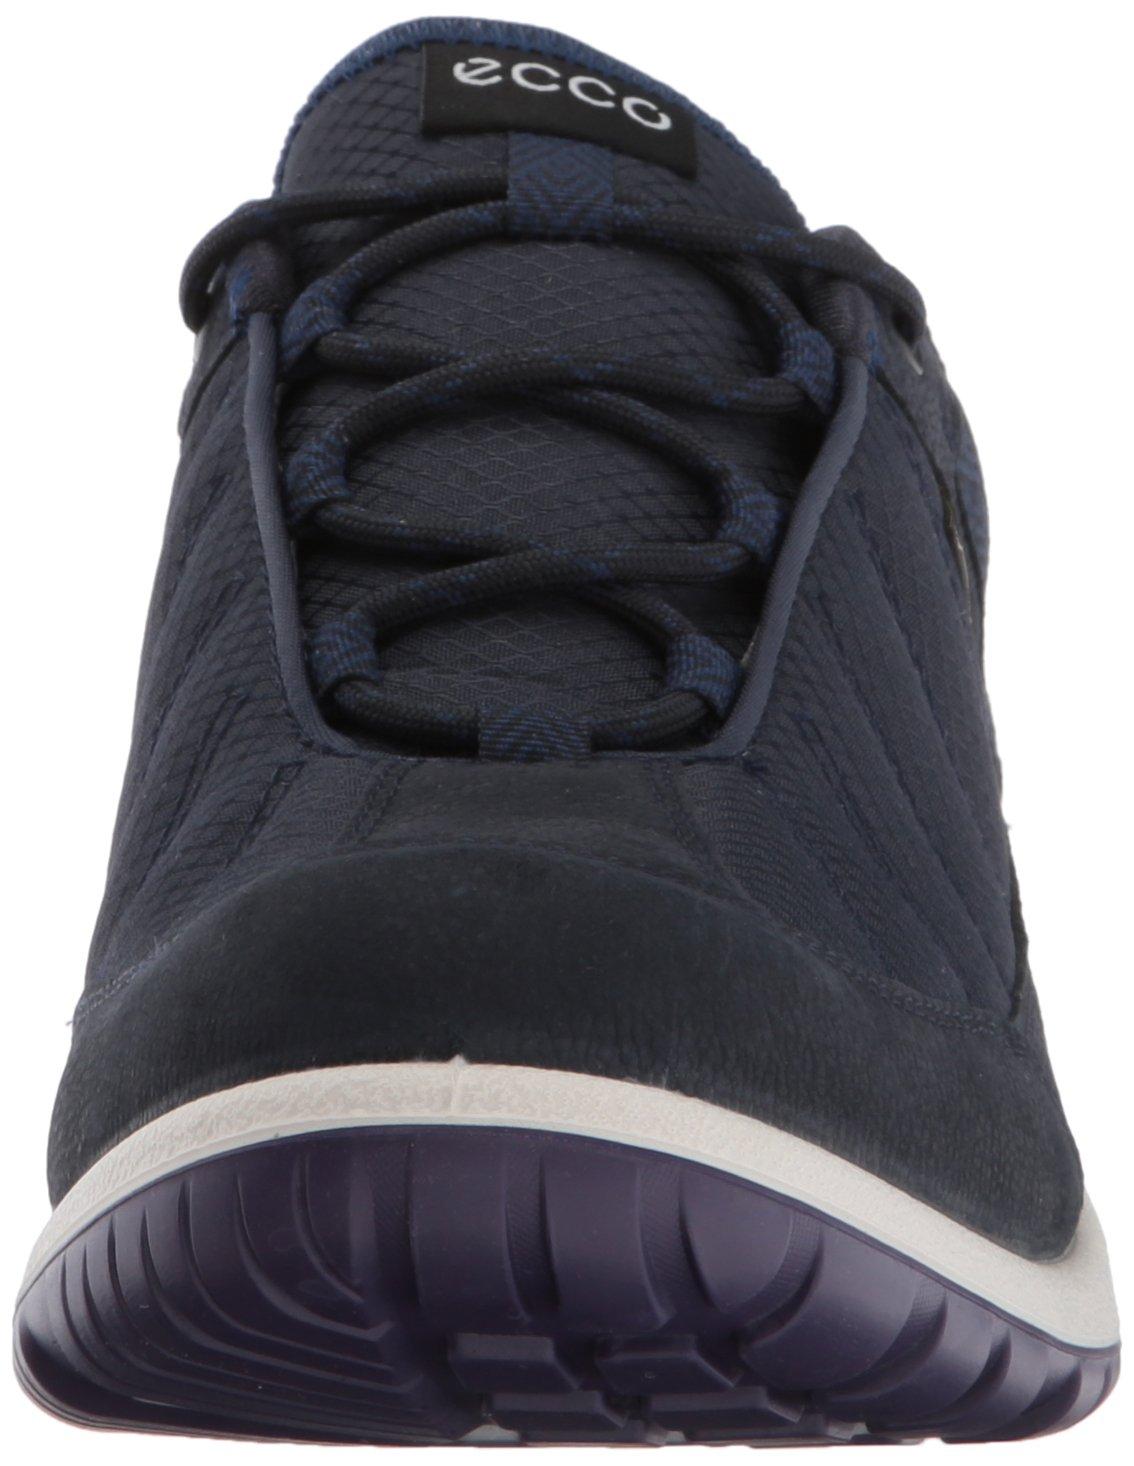 ECCO Women's Aspina Low Gore-Tex Textile Hiking Shoe B01M7U6KCZ 41 EU / 10-10.5 US Navy/True Navy